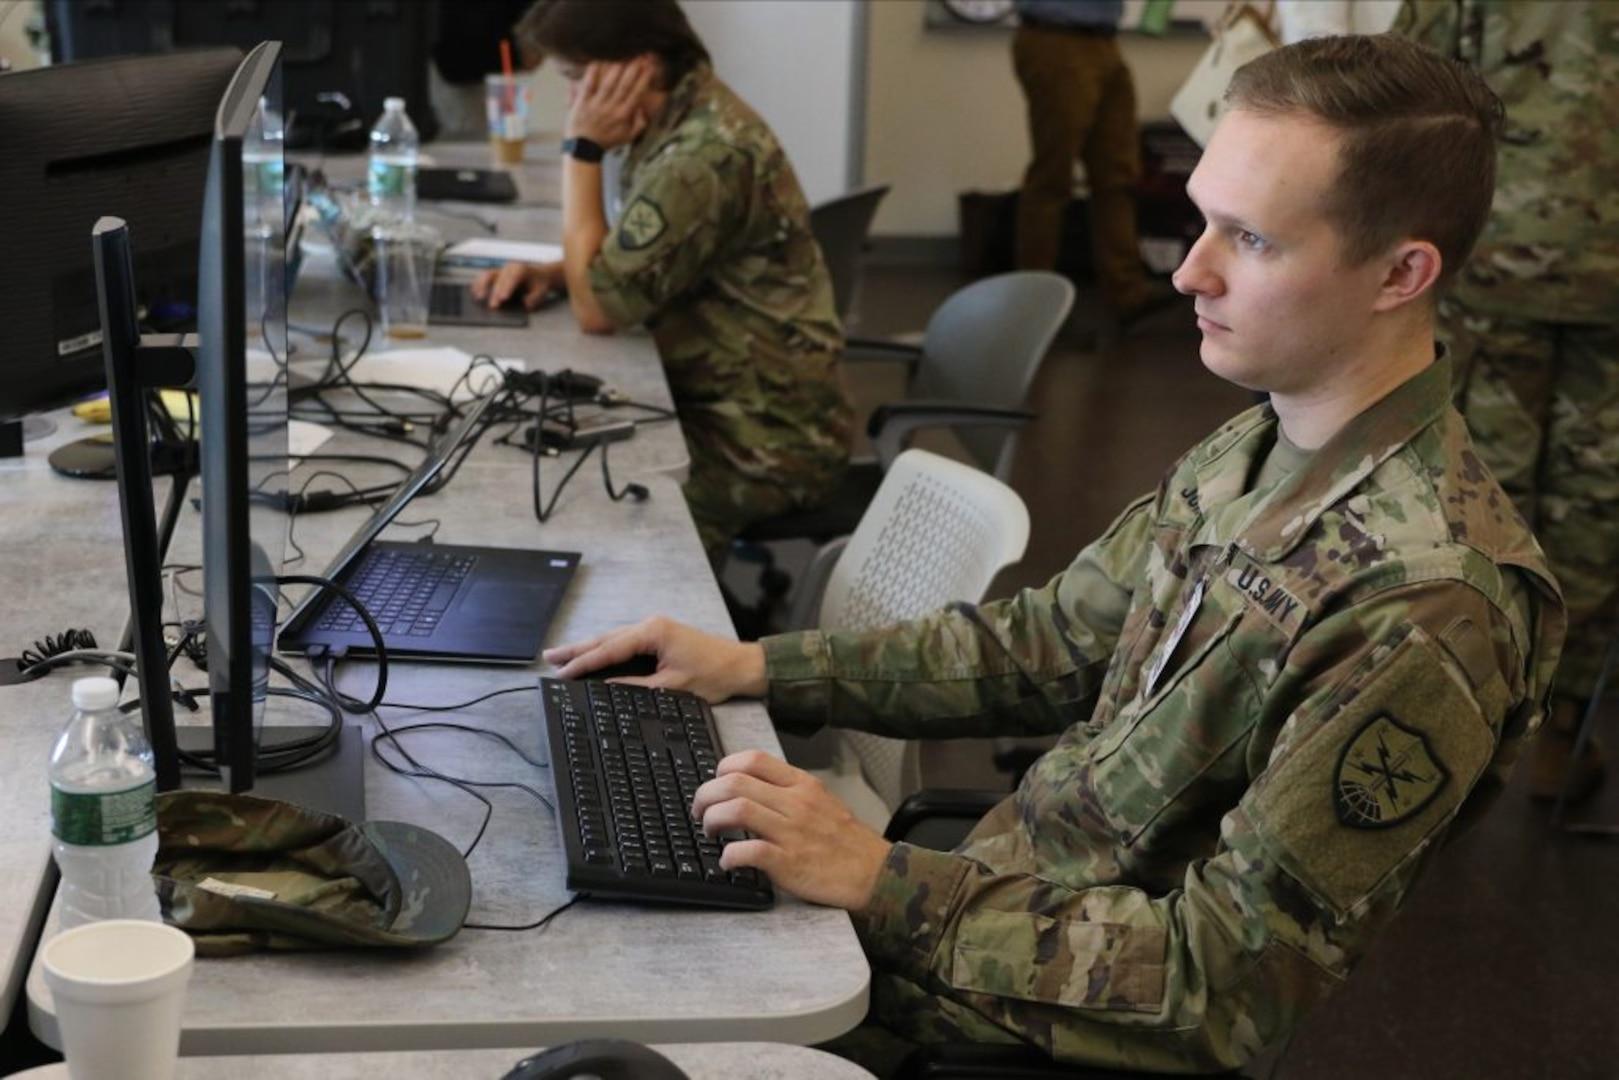 91st Cyber Brigade hosts Cyber Yankee '19 using ShadowNet enterprise solution